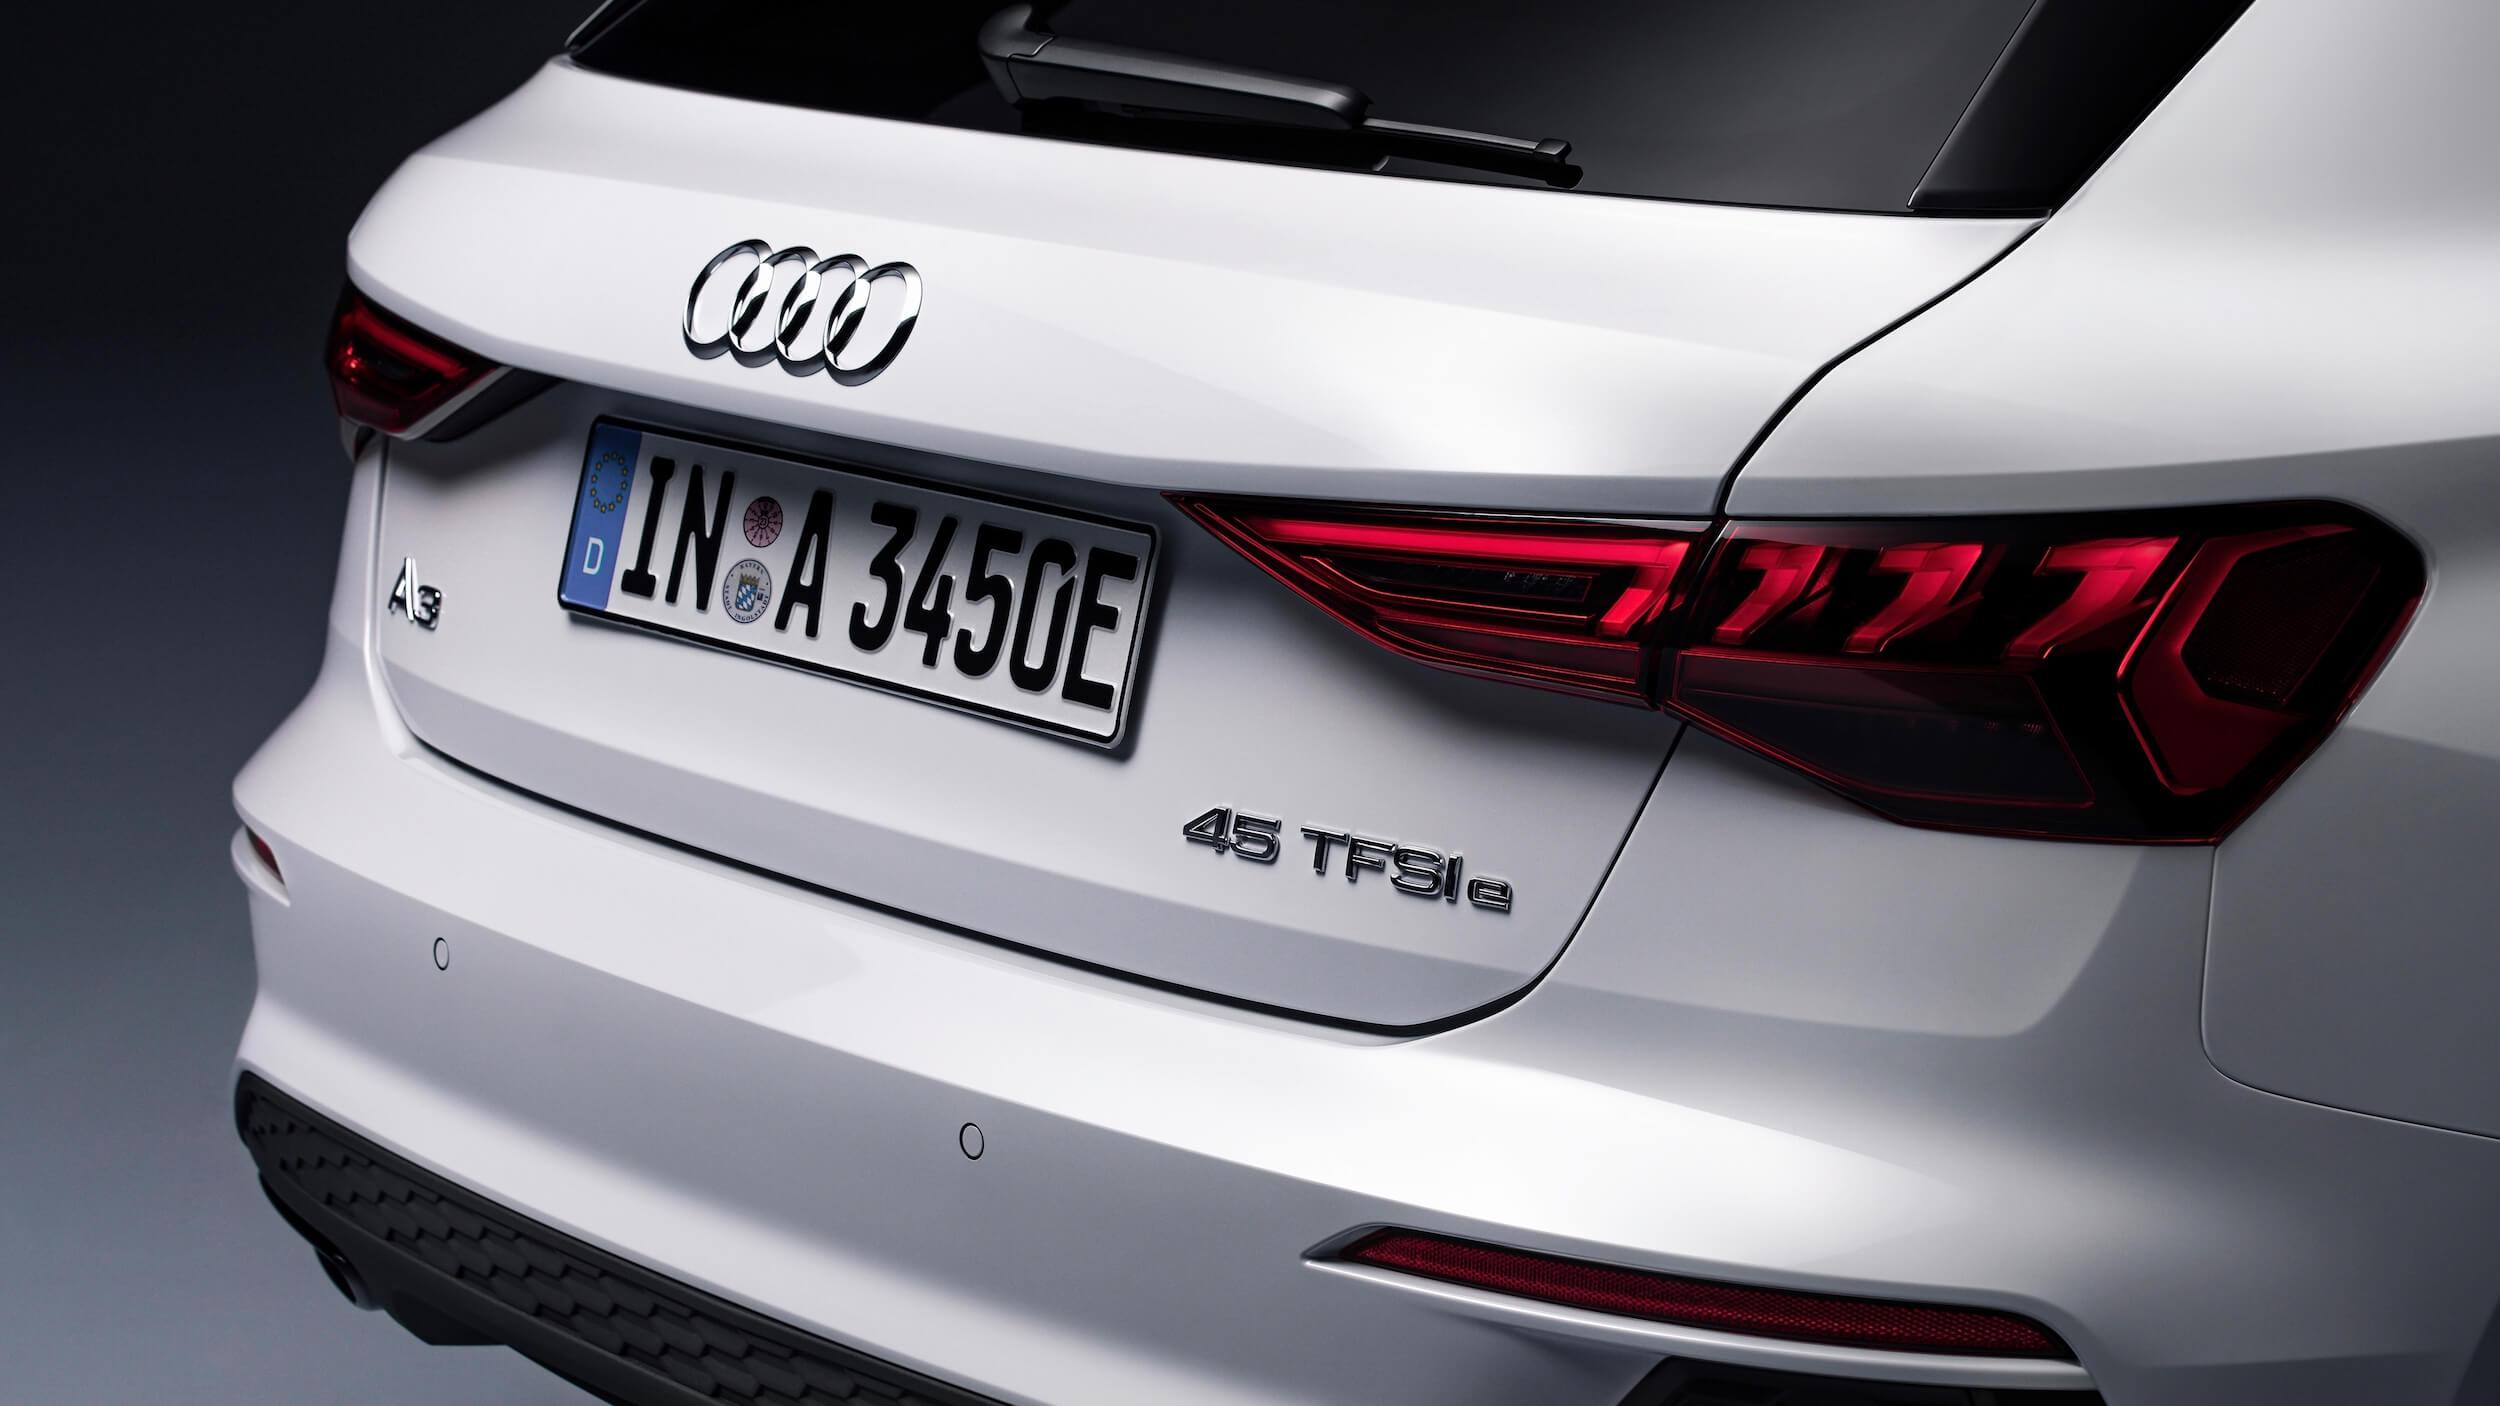 Audi A3 Sportback 45 TFSIe badge